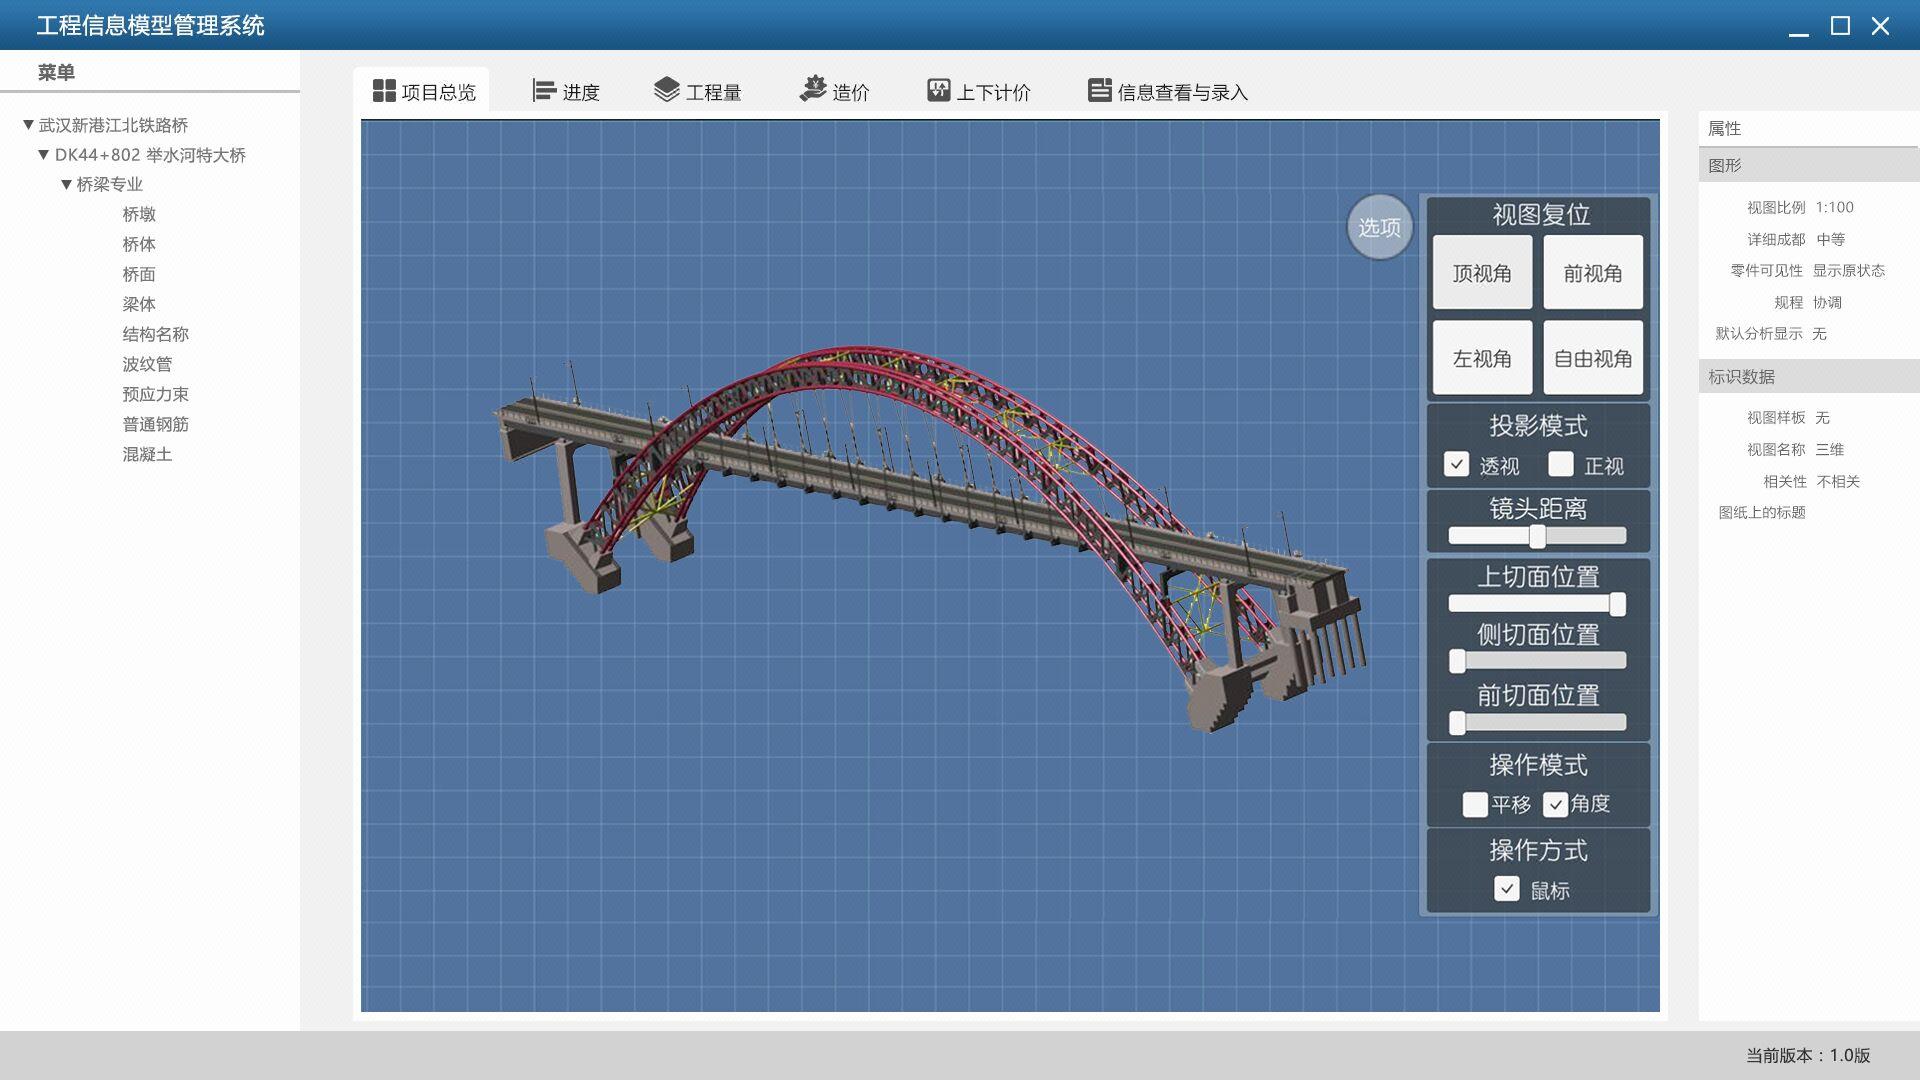 BIM运维管理/三维模型制作/revit建模/工程软件开发